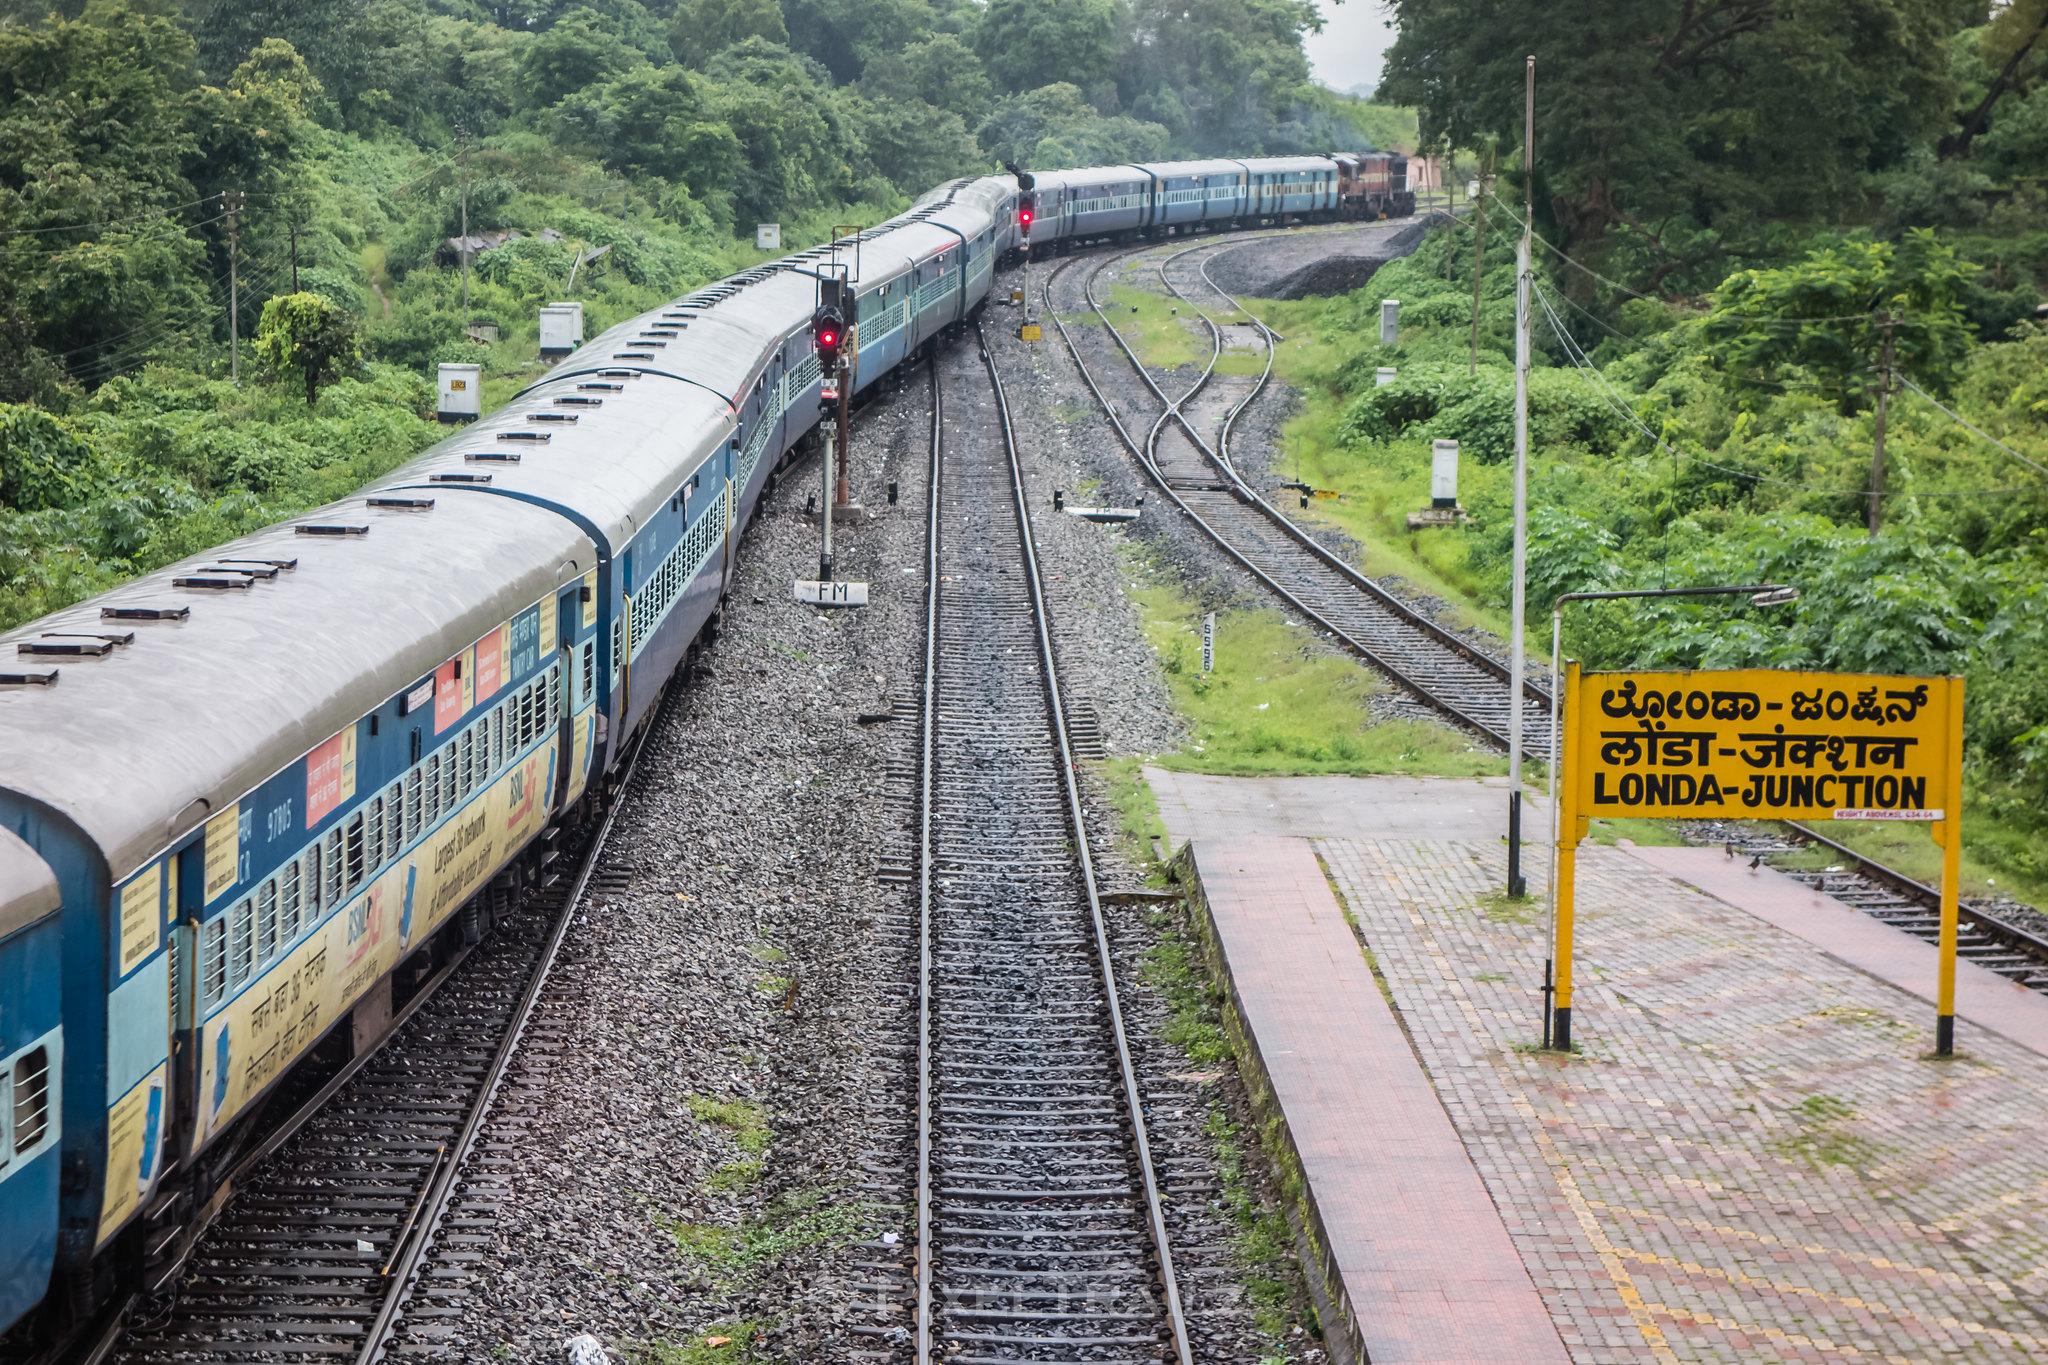 Poorna Express